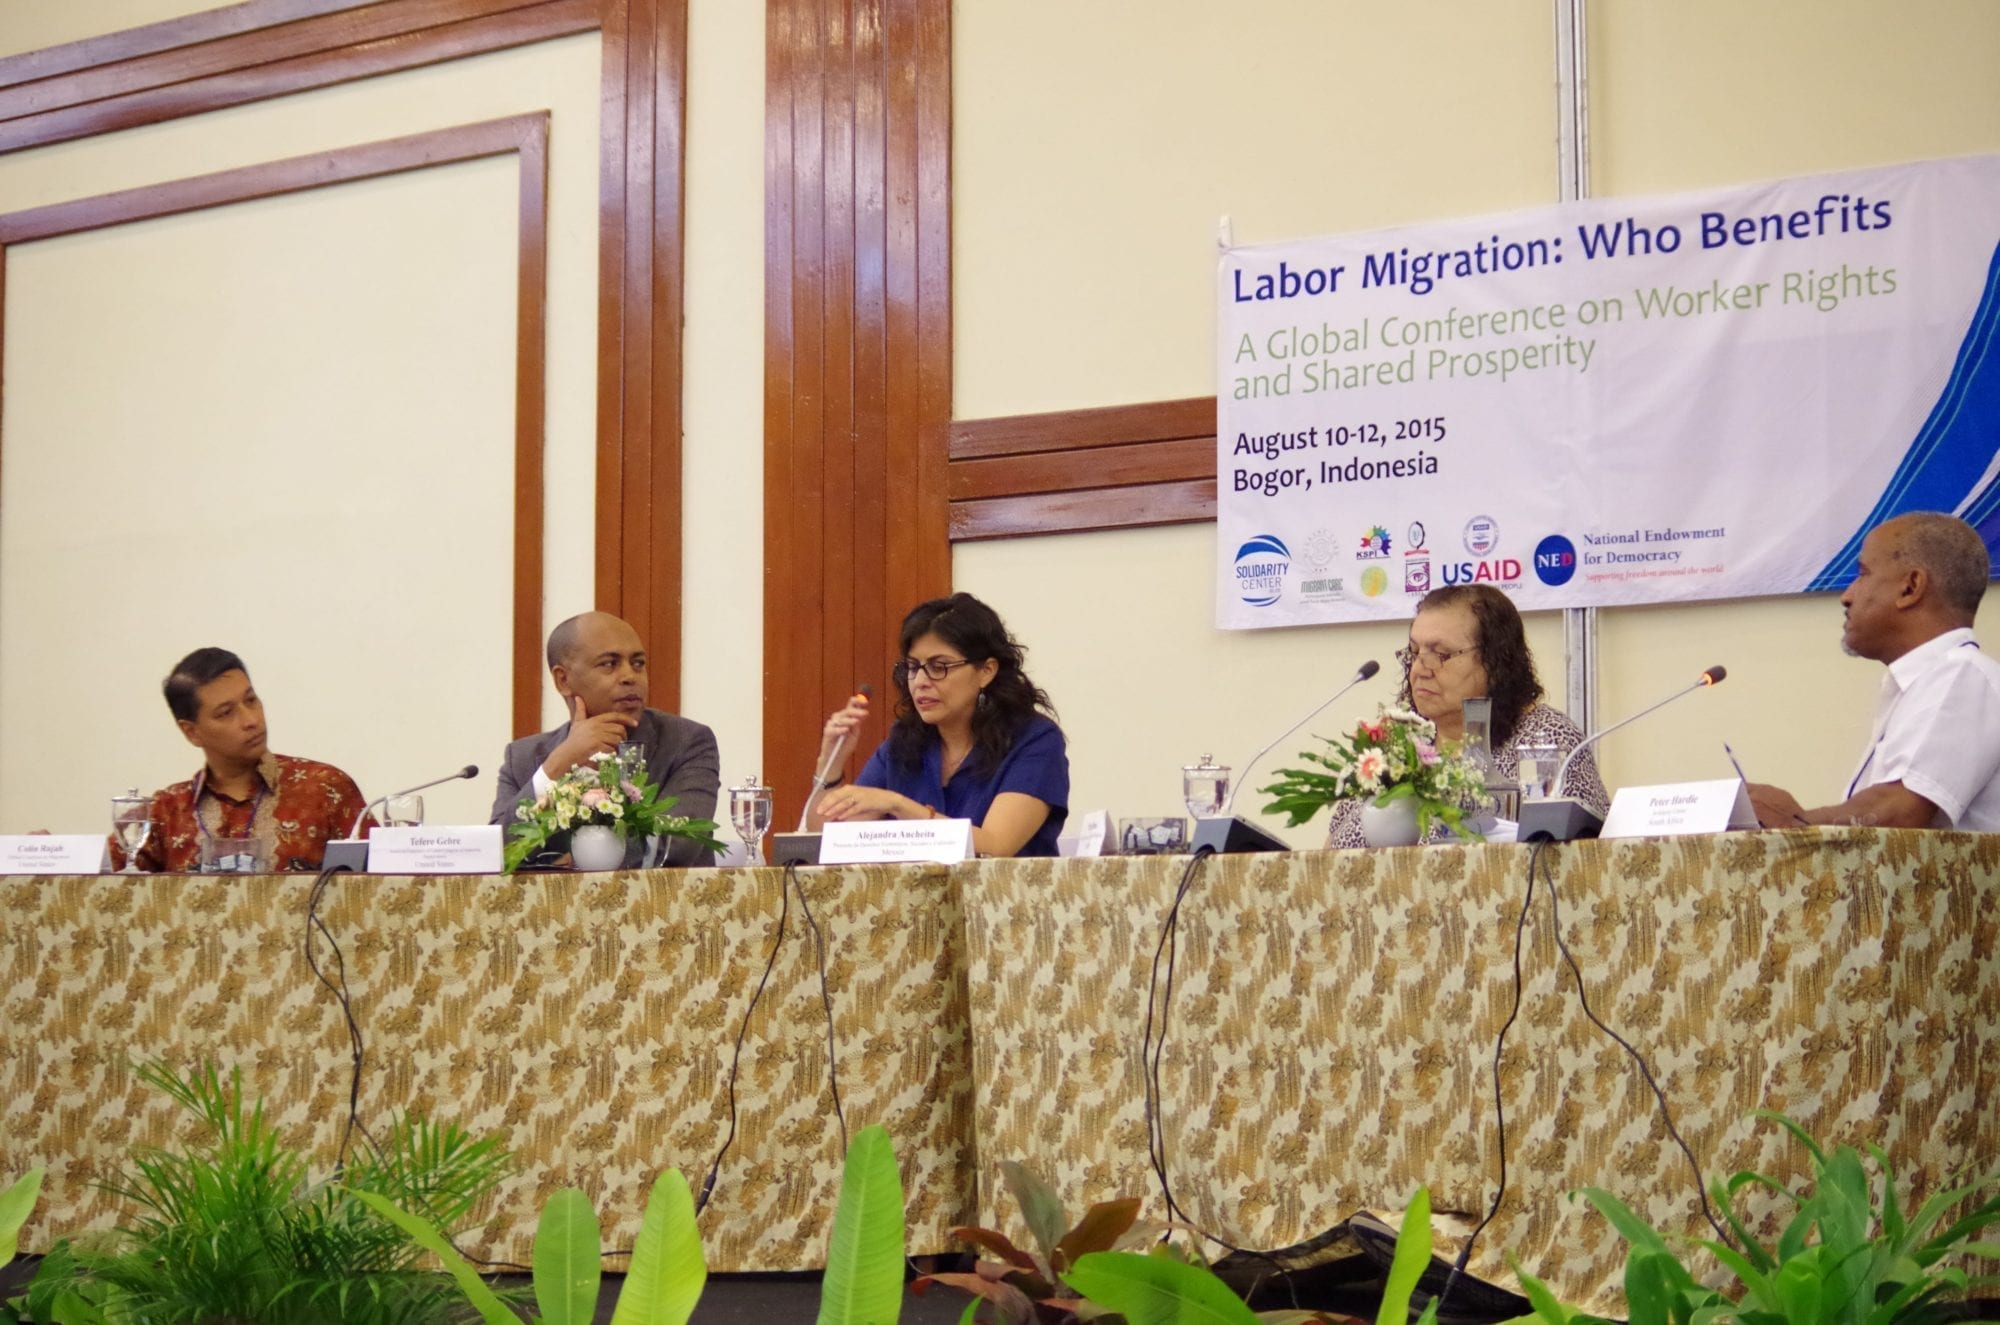 migrant workers, Solidarity Center, Tefere Gebre, AFL-CIO